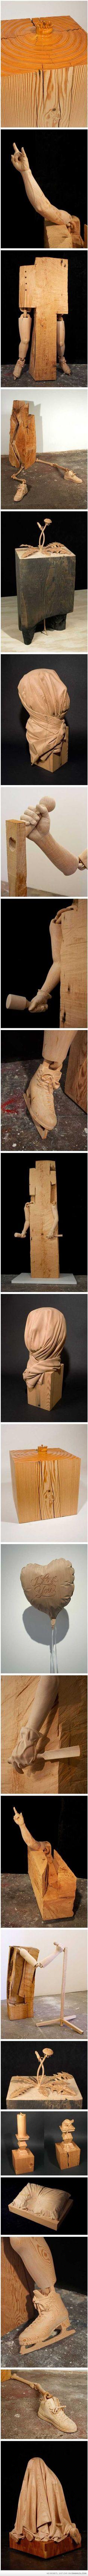 Awe-inspiring Sculptures By Dan Webb